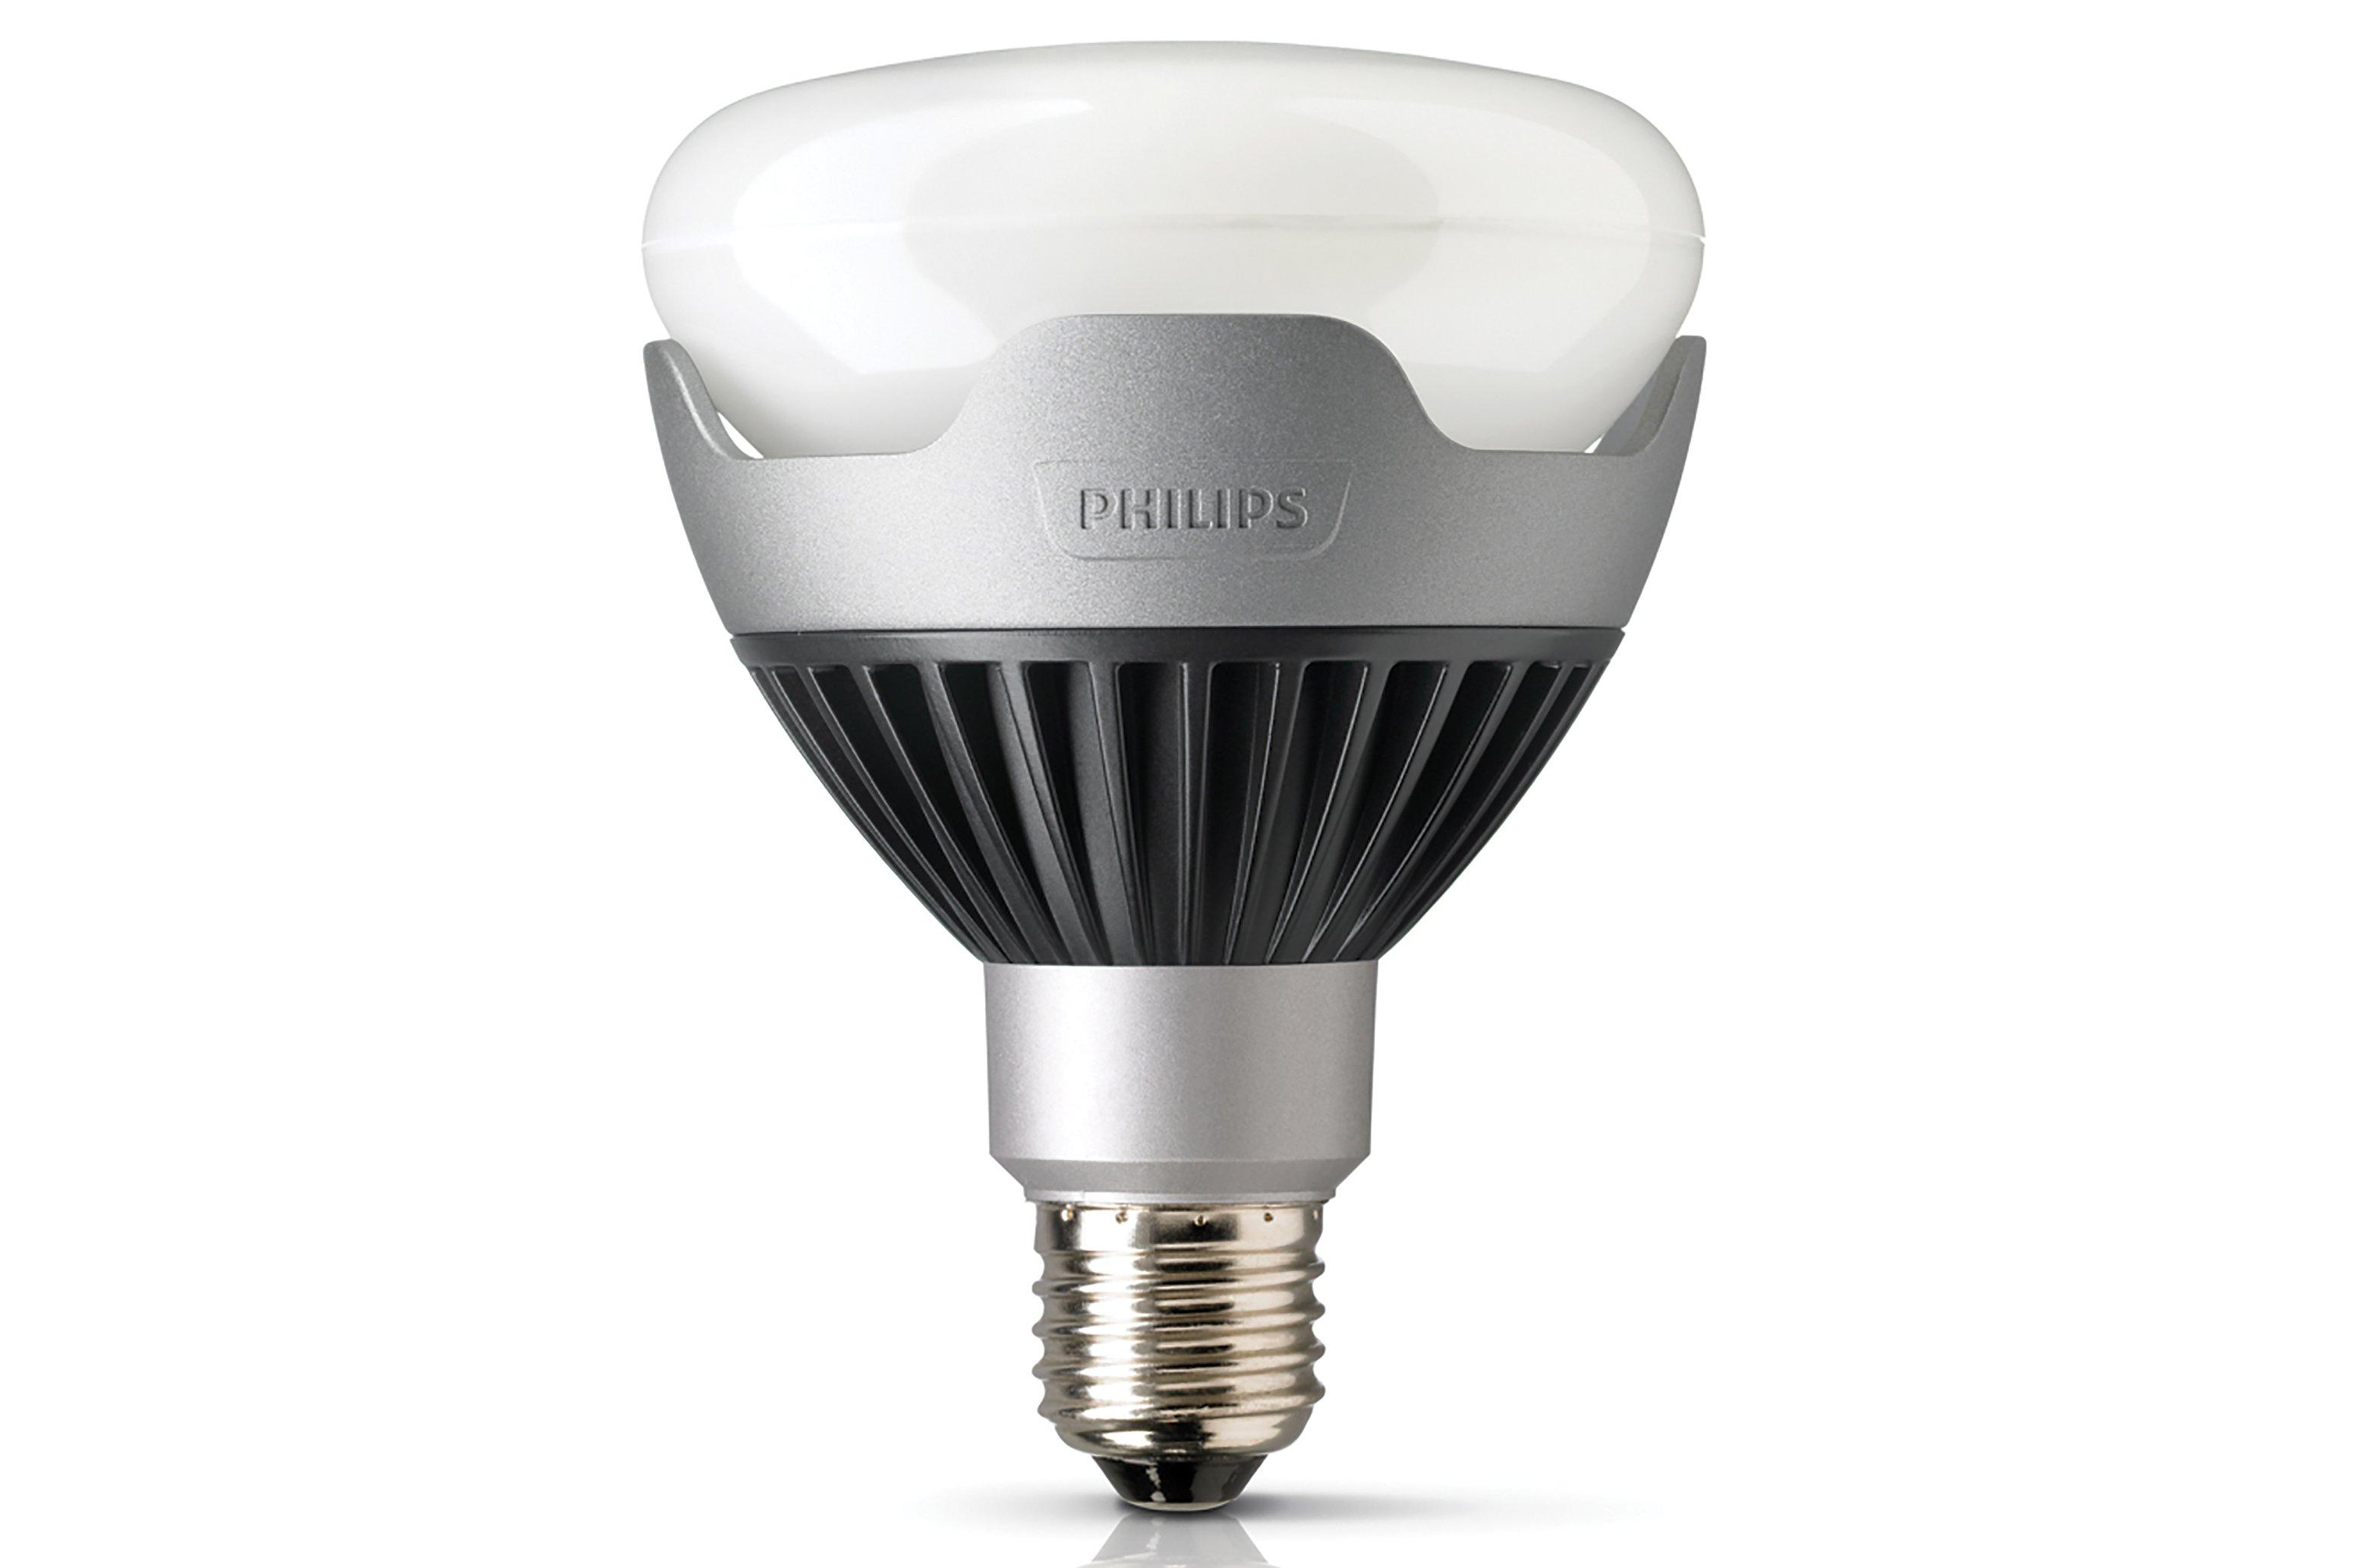 led bulb philips light clear main large lighting filament product